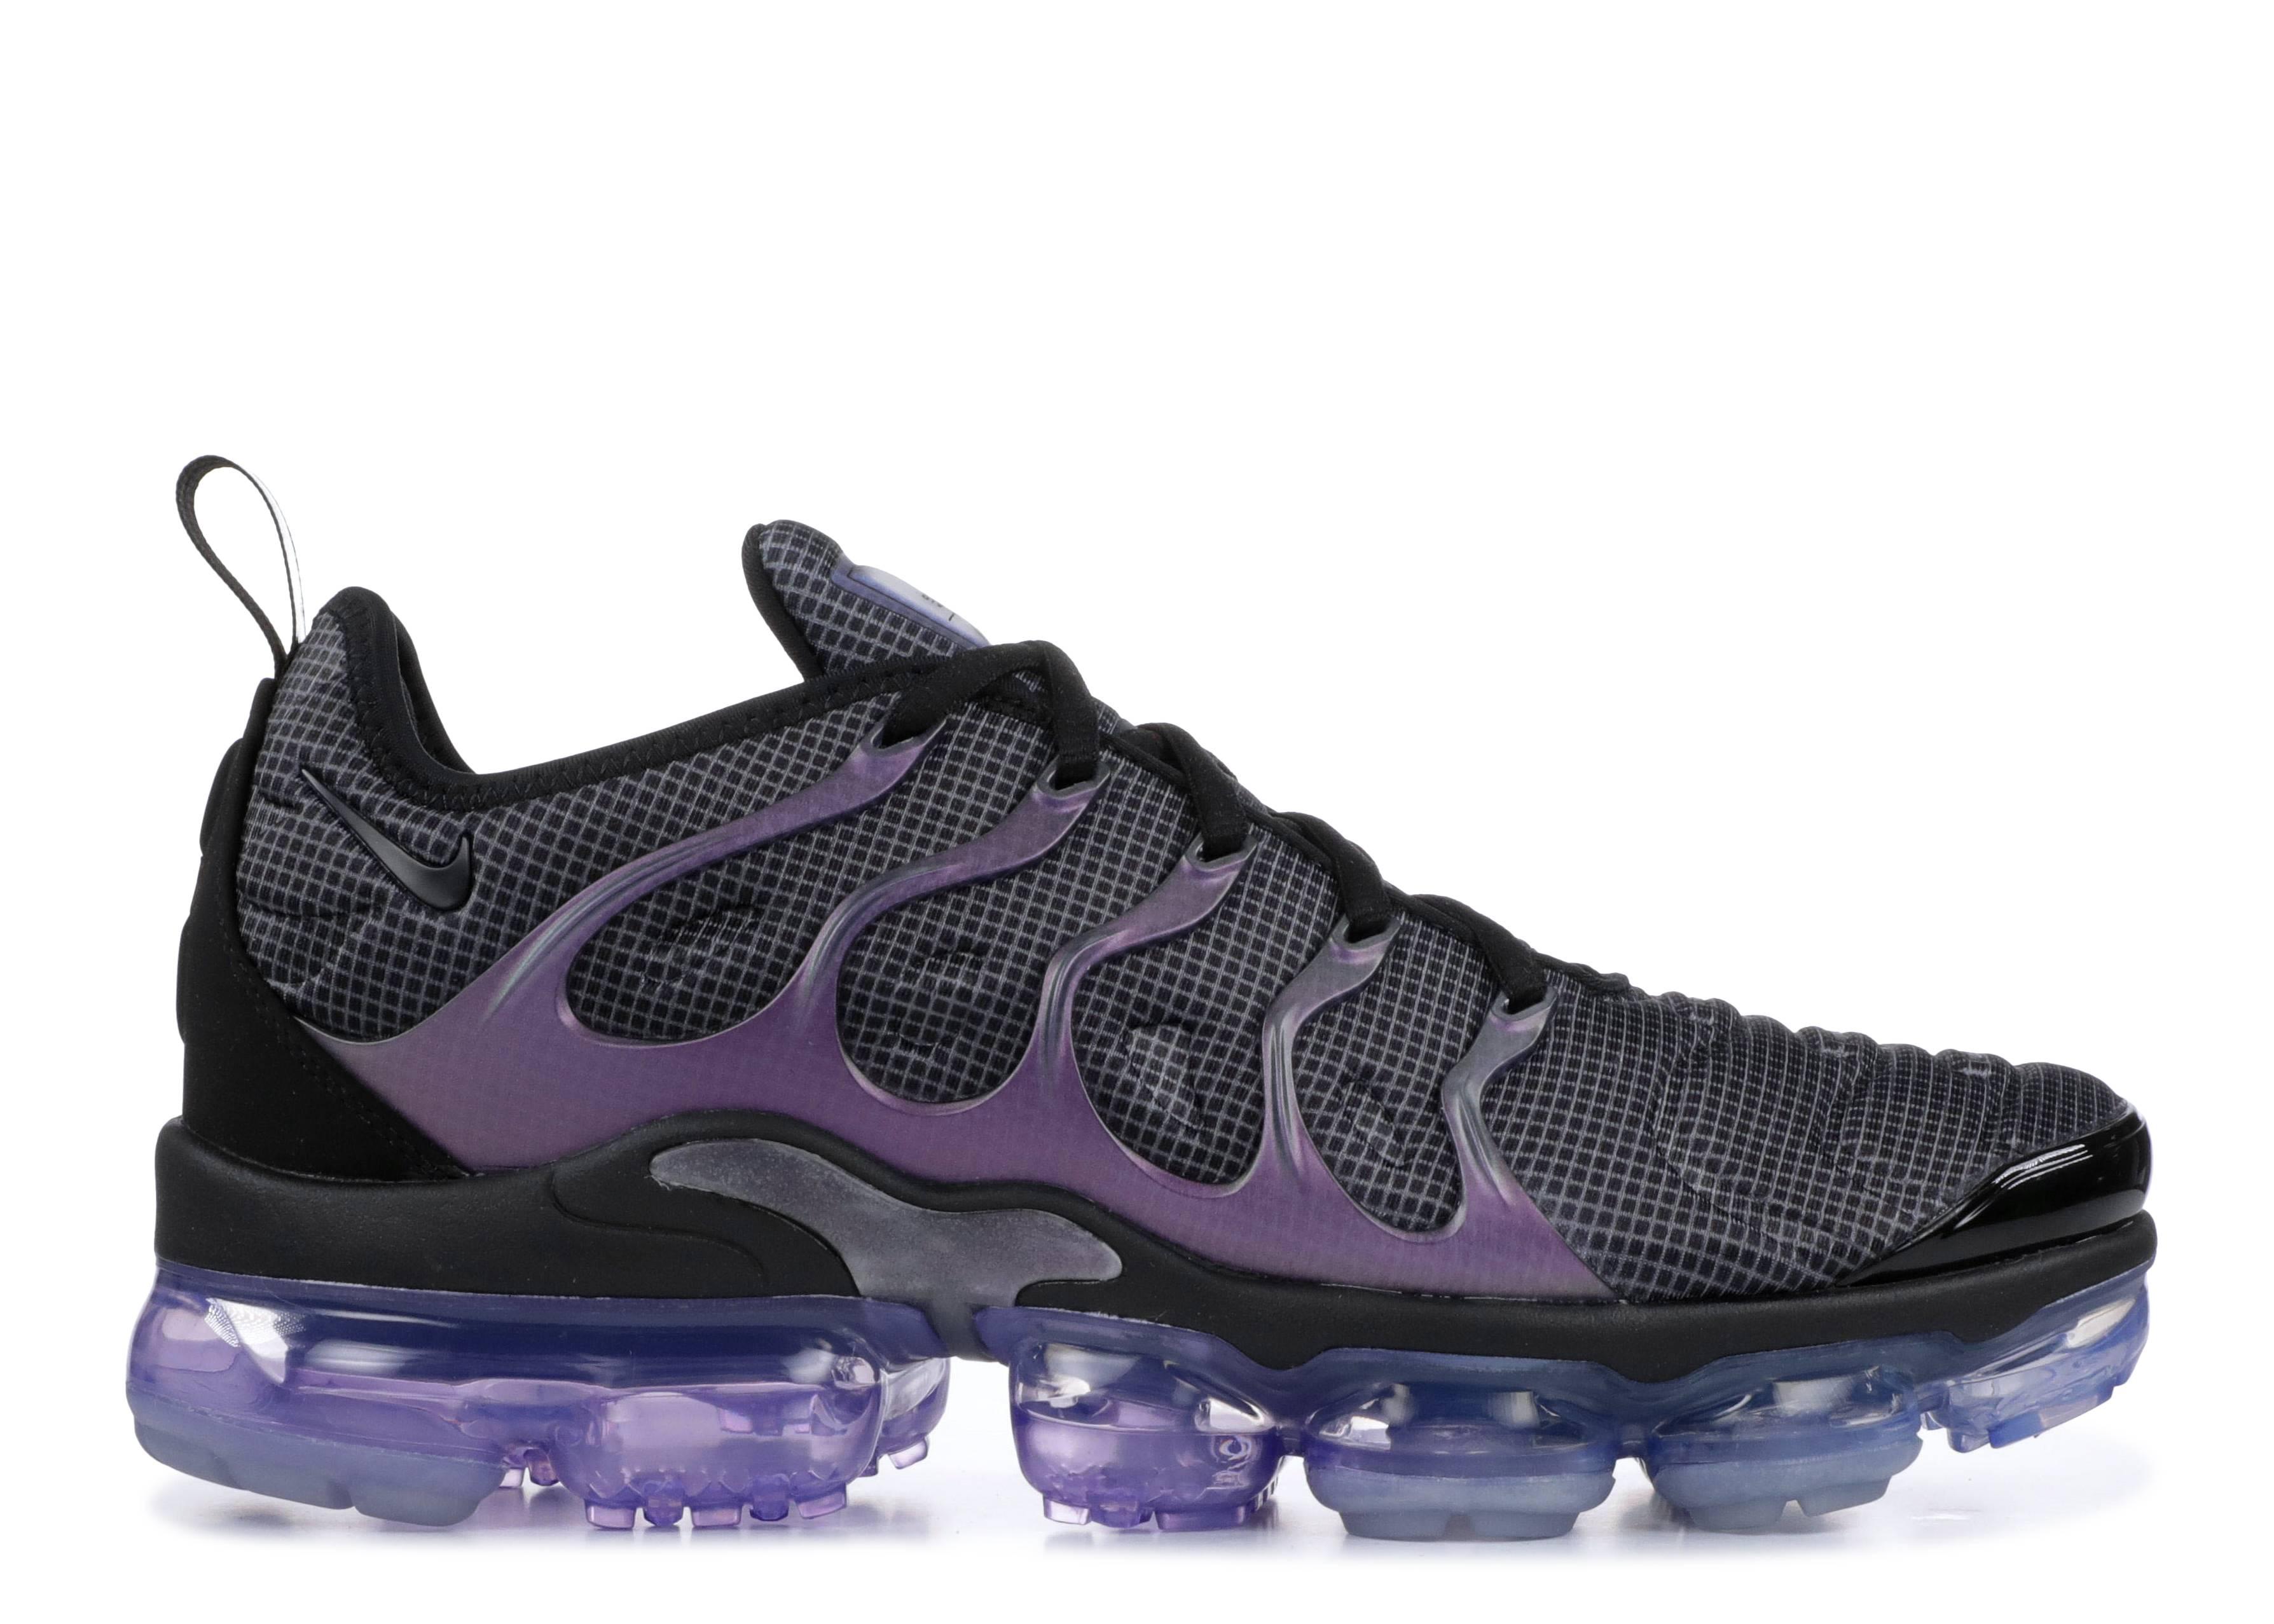 90d1e7608b1 Air Vapormax Plus - Nike - 924453 014 - black black-dark grey ...